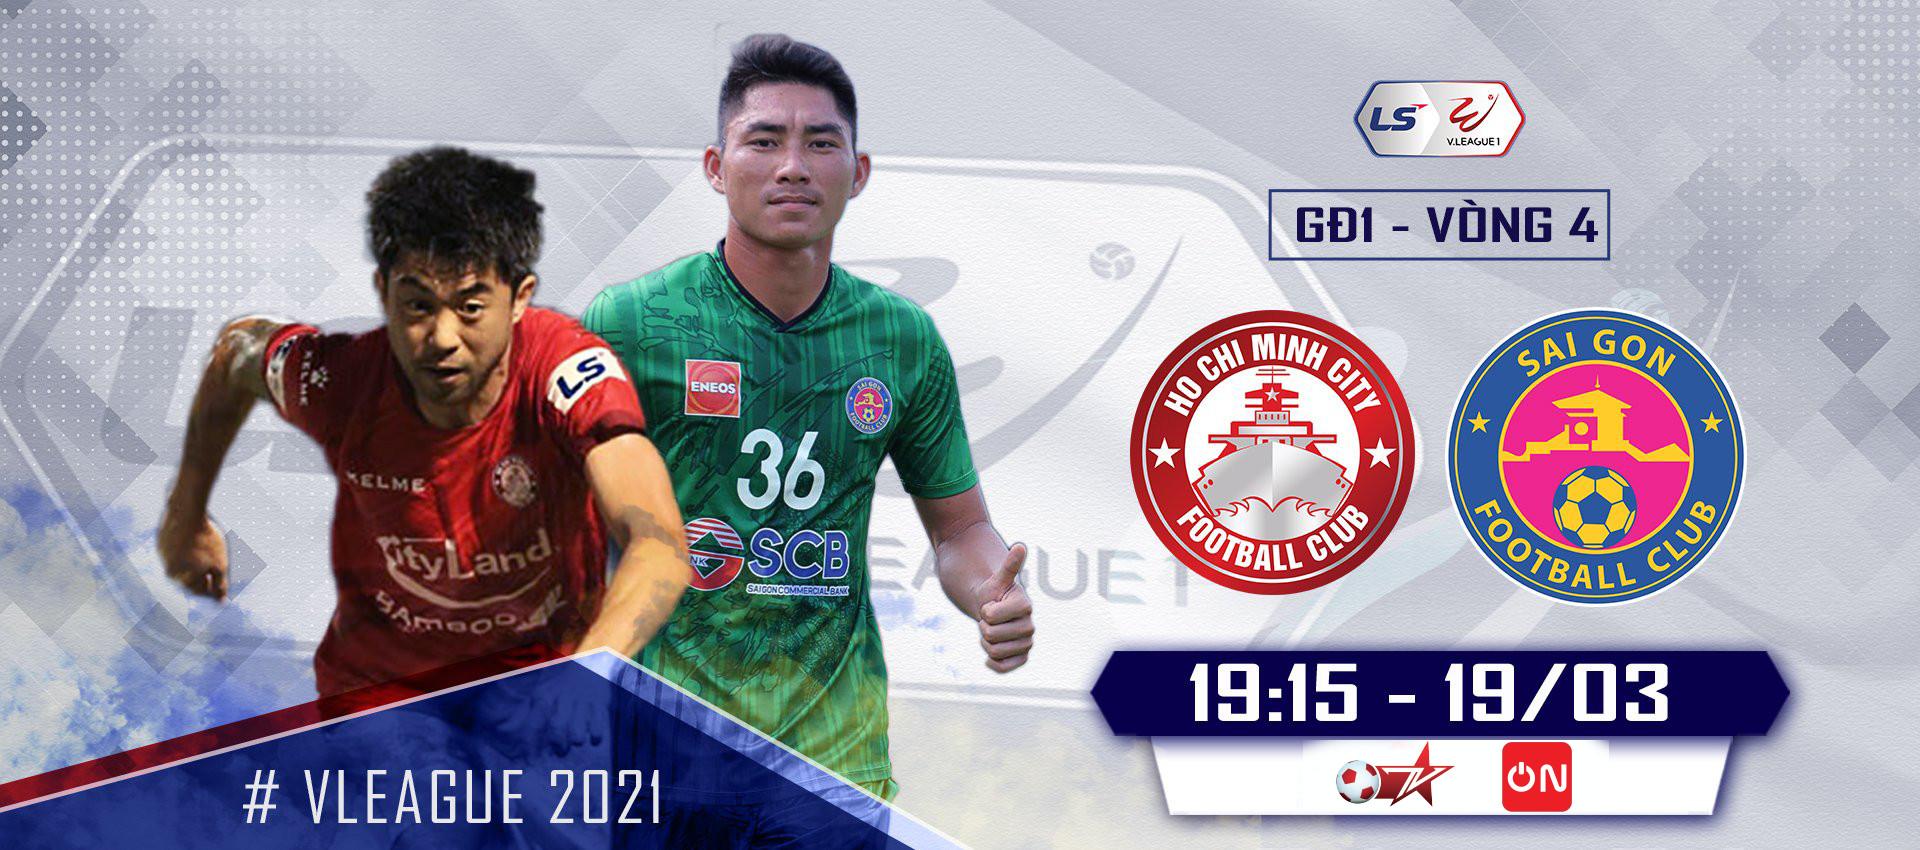 HCMC - Saigon: Apakah ini benar-benar derby?  - 2